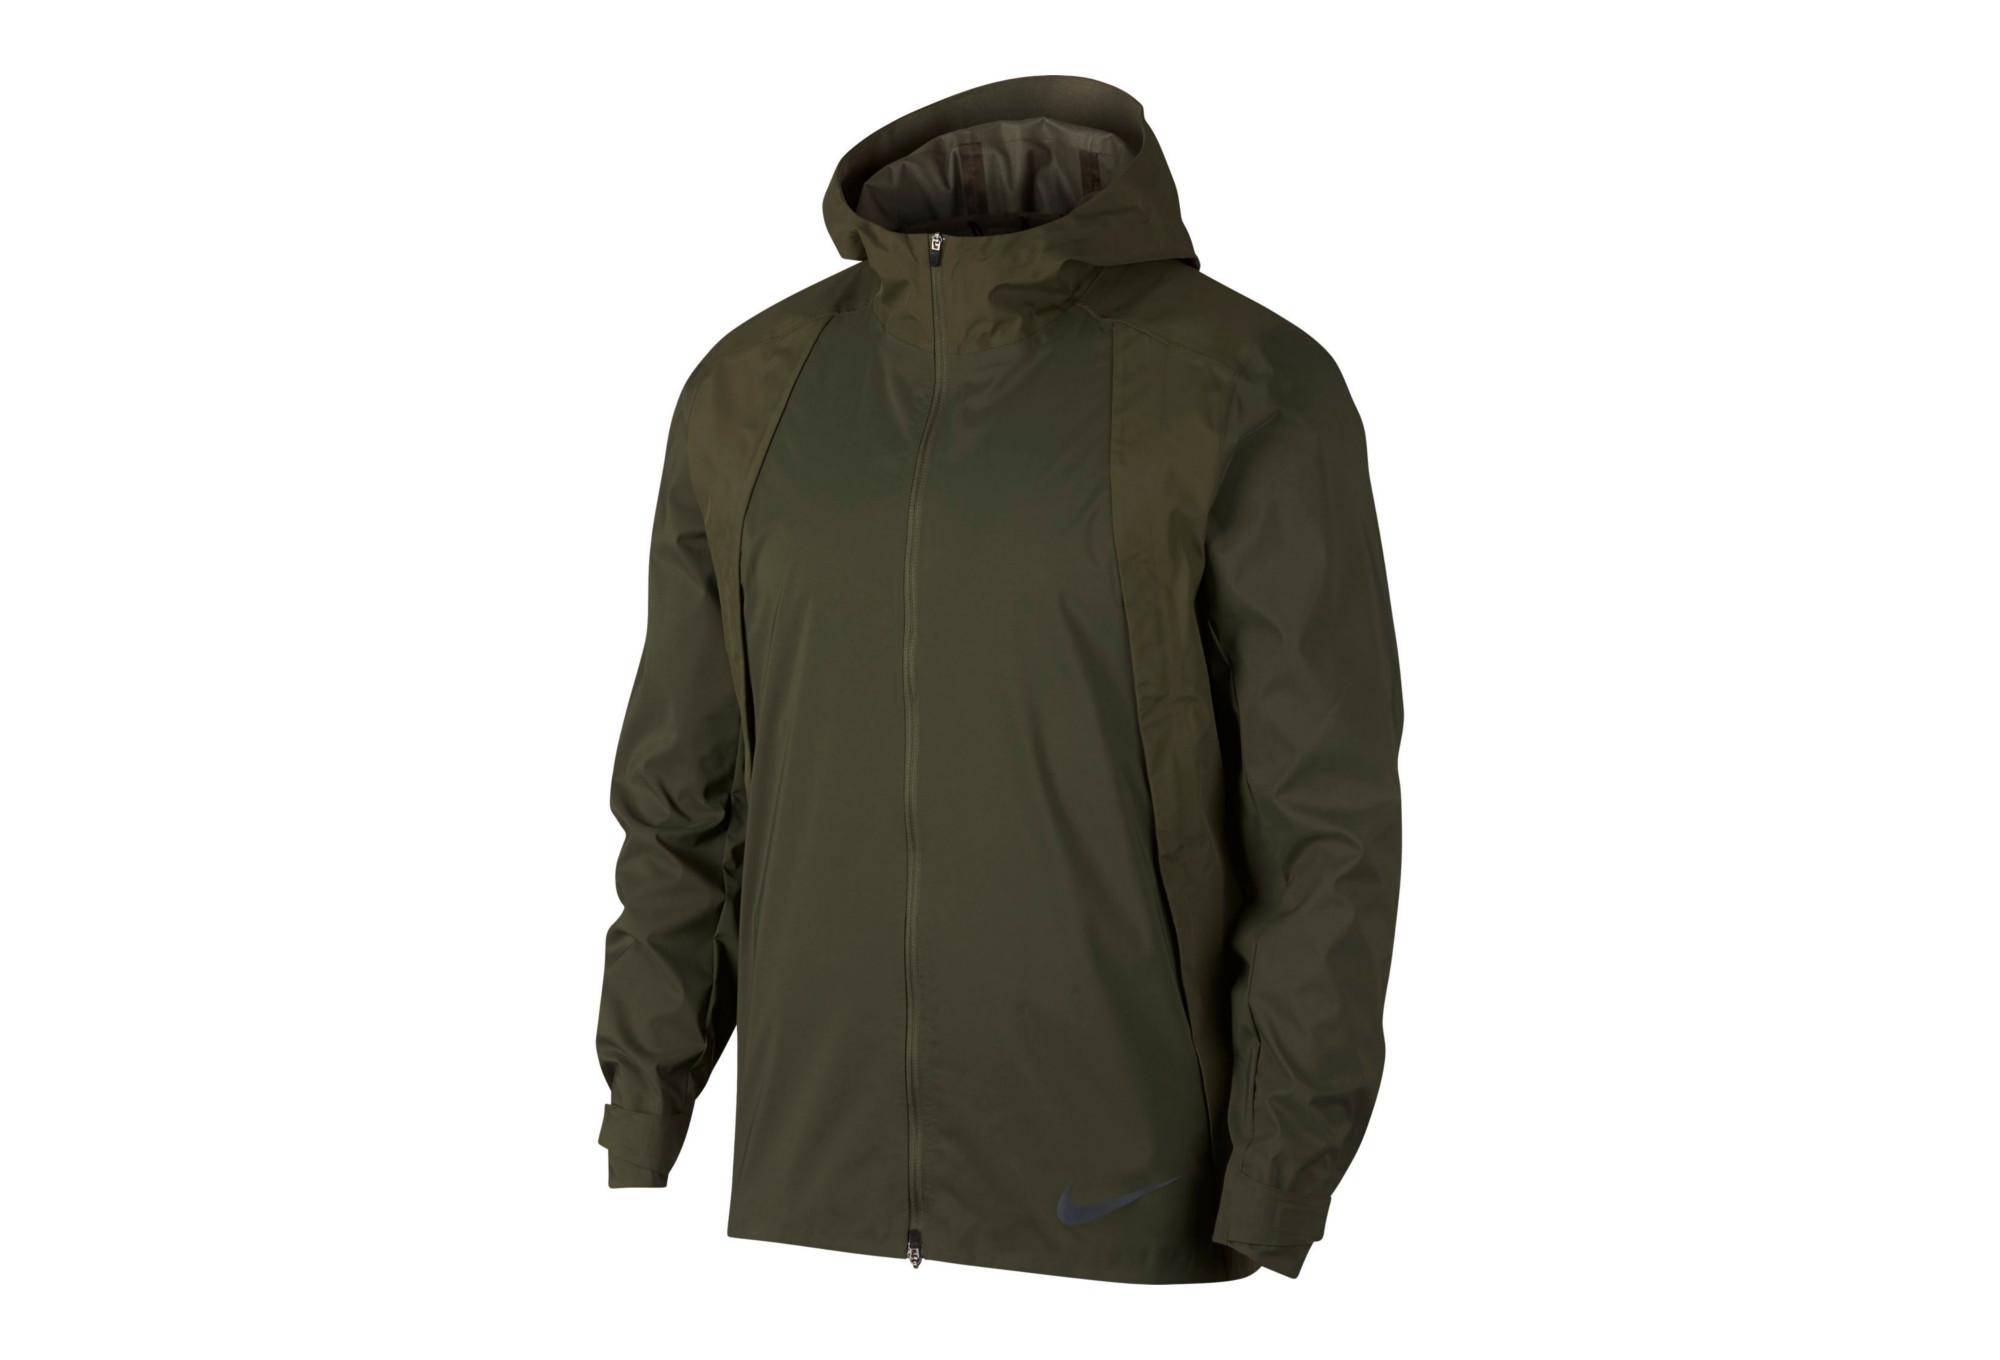 Humillar Espera un minuto pelota  na razprodaji ZDA poceni prodaja dobra storitev nike aeroshield running  jacket mens - theofficialpingmagazine.com